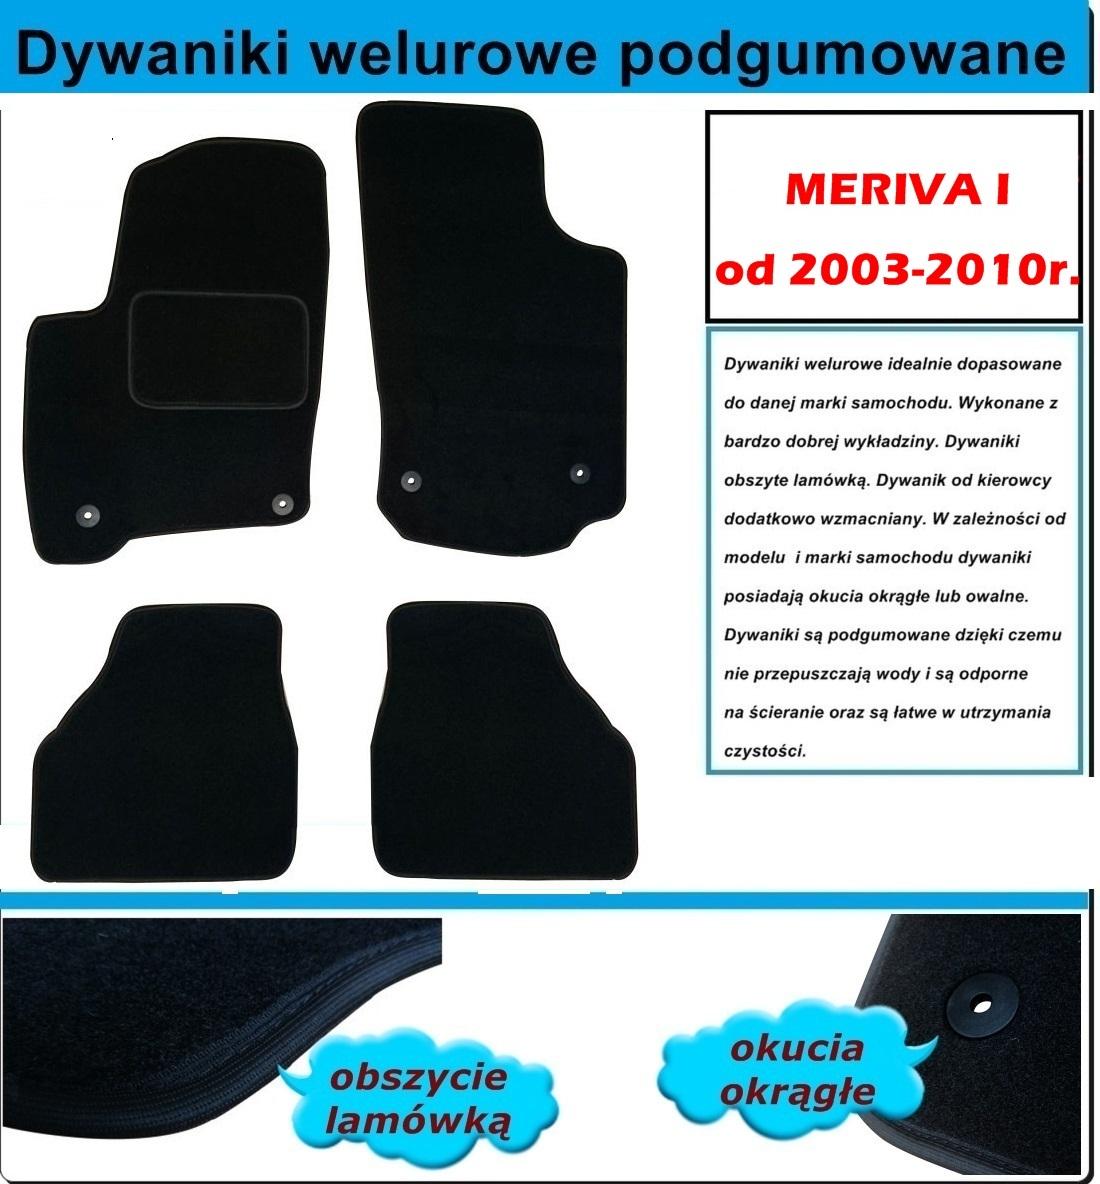 http://sklep.trio.com.pl/galerie/d/dywaniki-welurowe-do-samochod_27791.jpg